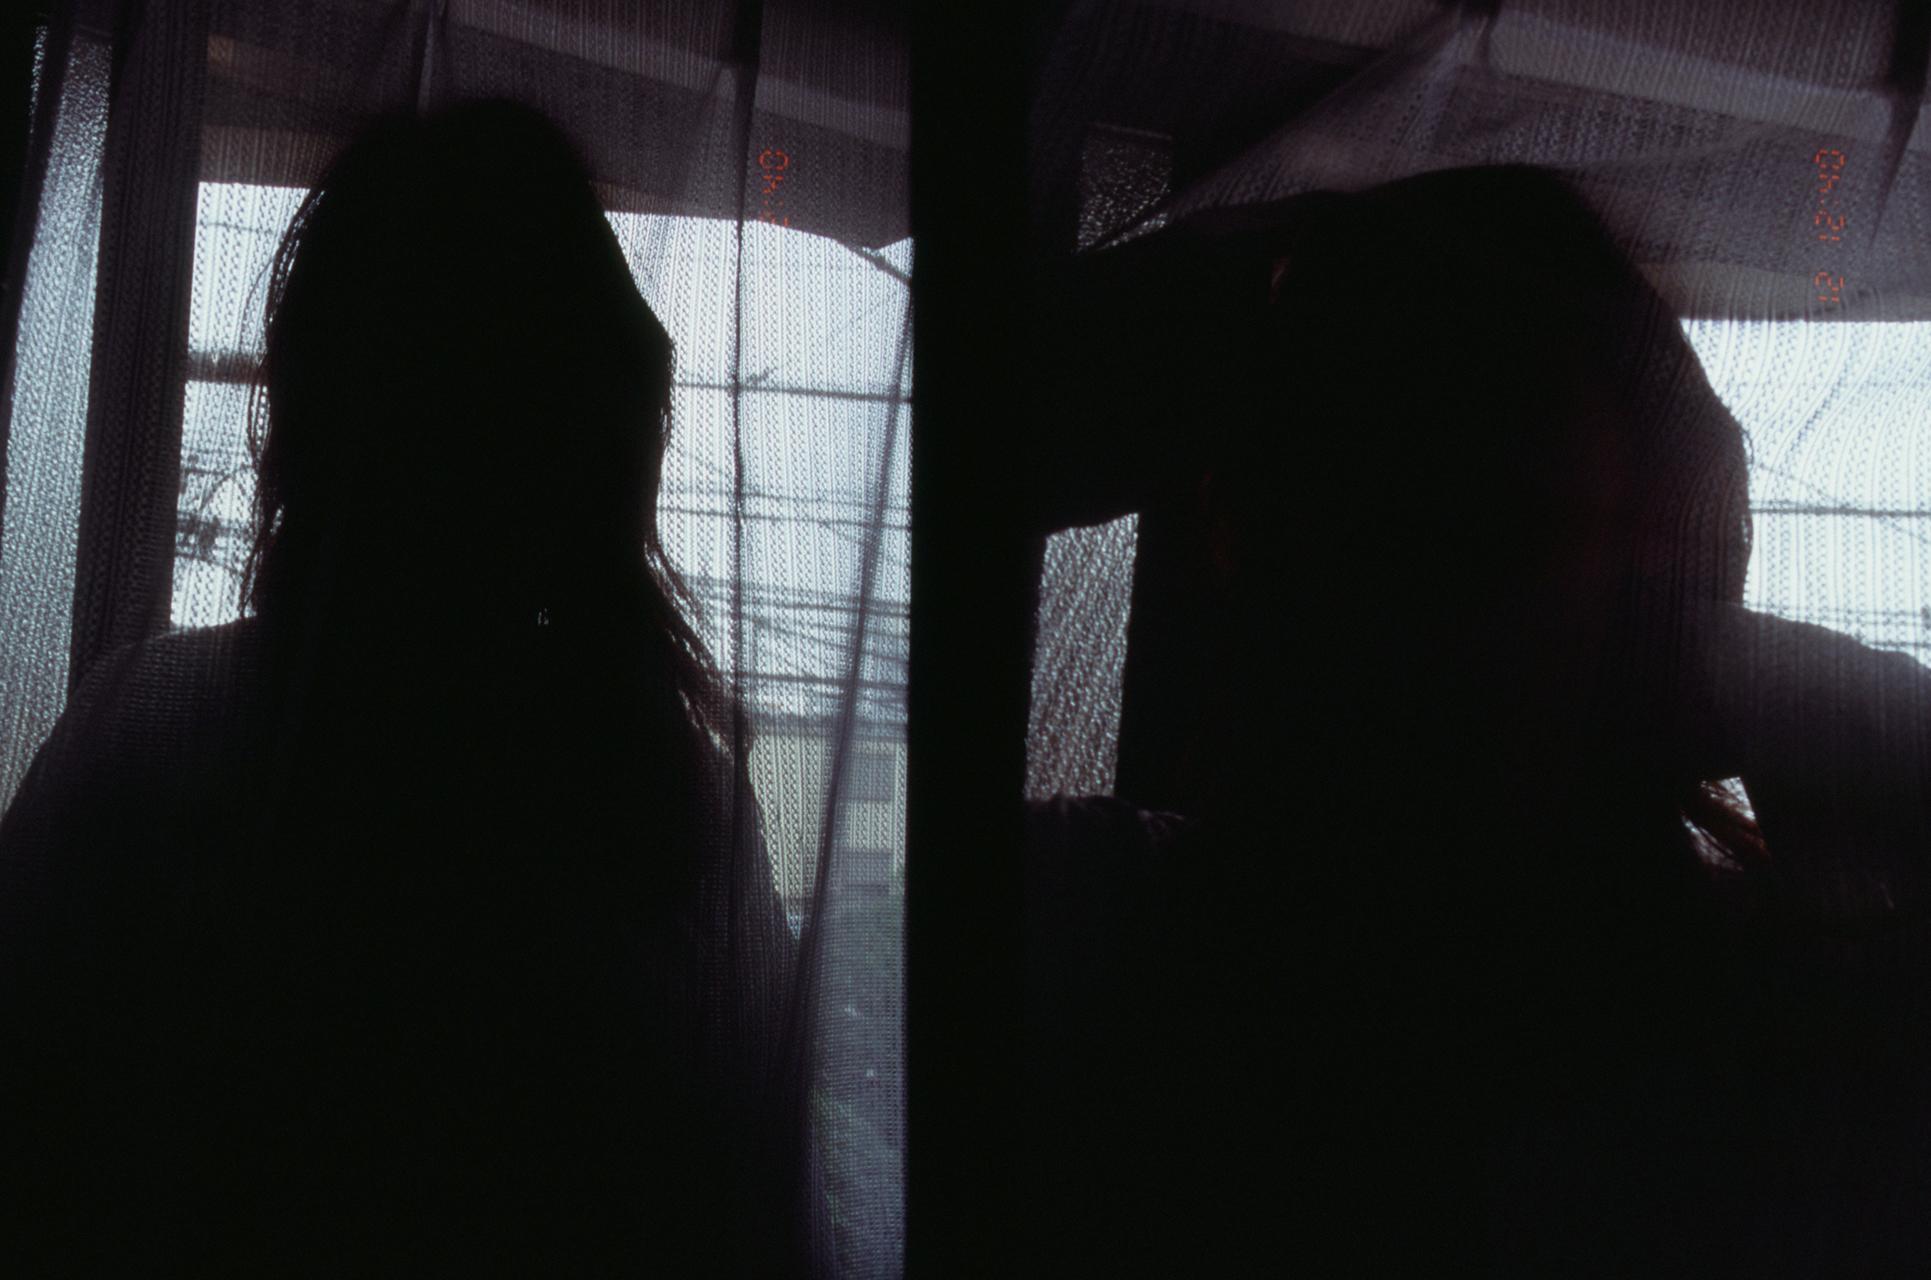 辰巳憲史郎 | Kenshiro Tatsumi